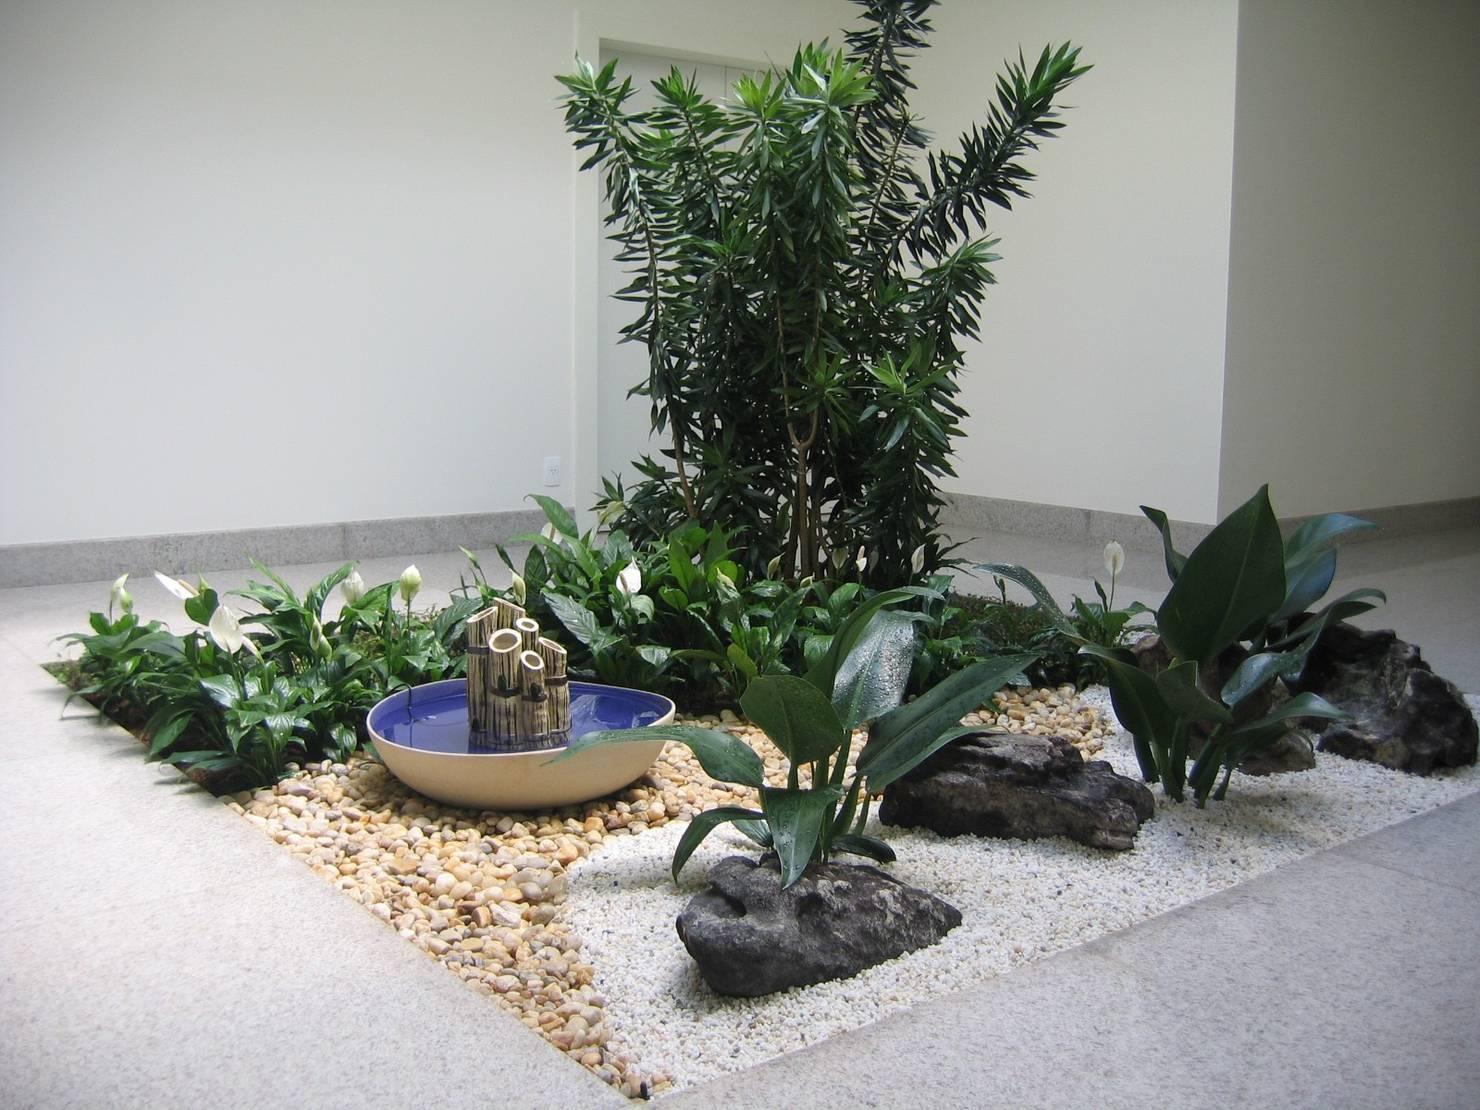 8 ways to make your indoor garden thrive!